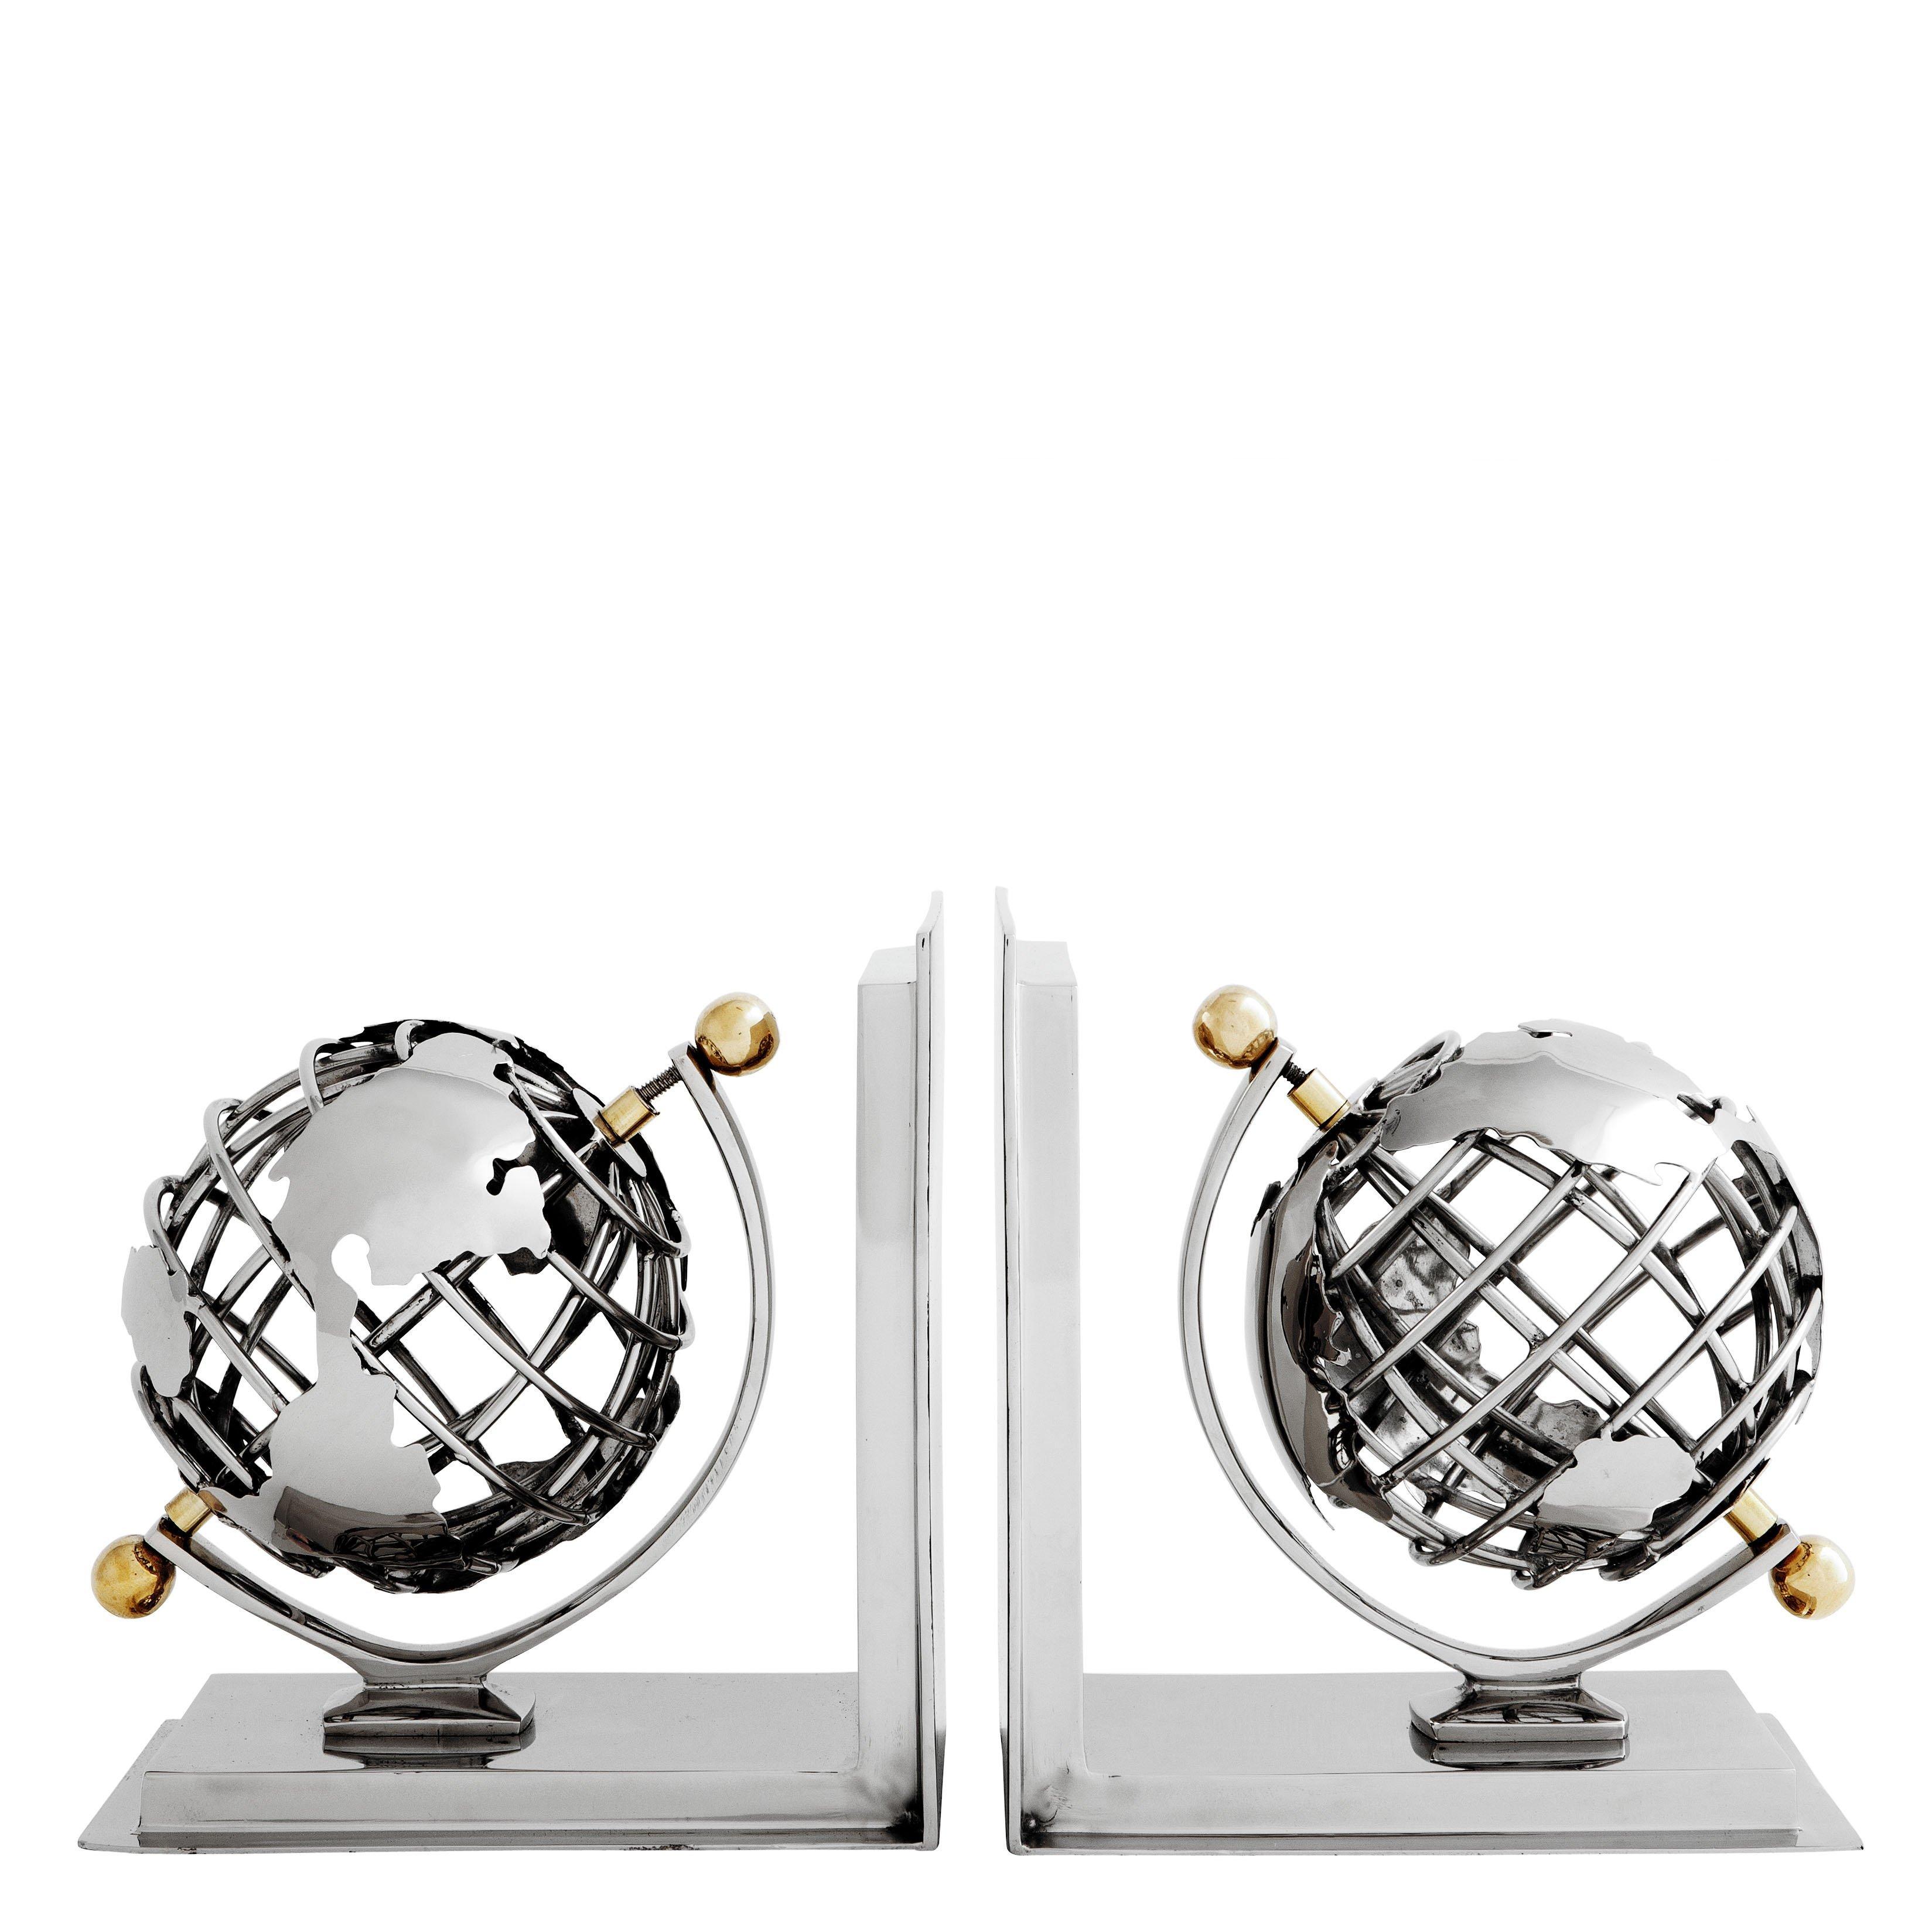 image-Eichholtz Bookend Globe set of 2 nickel finish polished brass